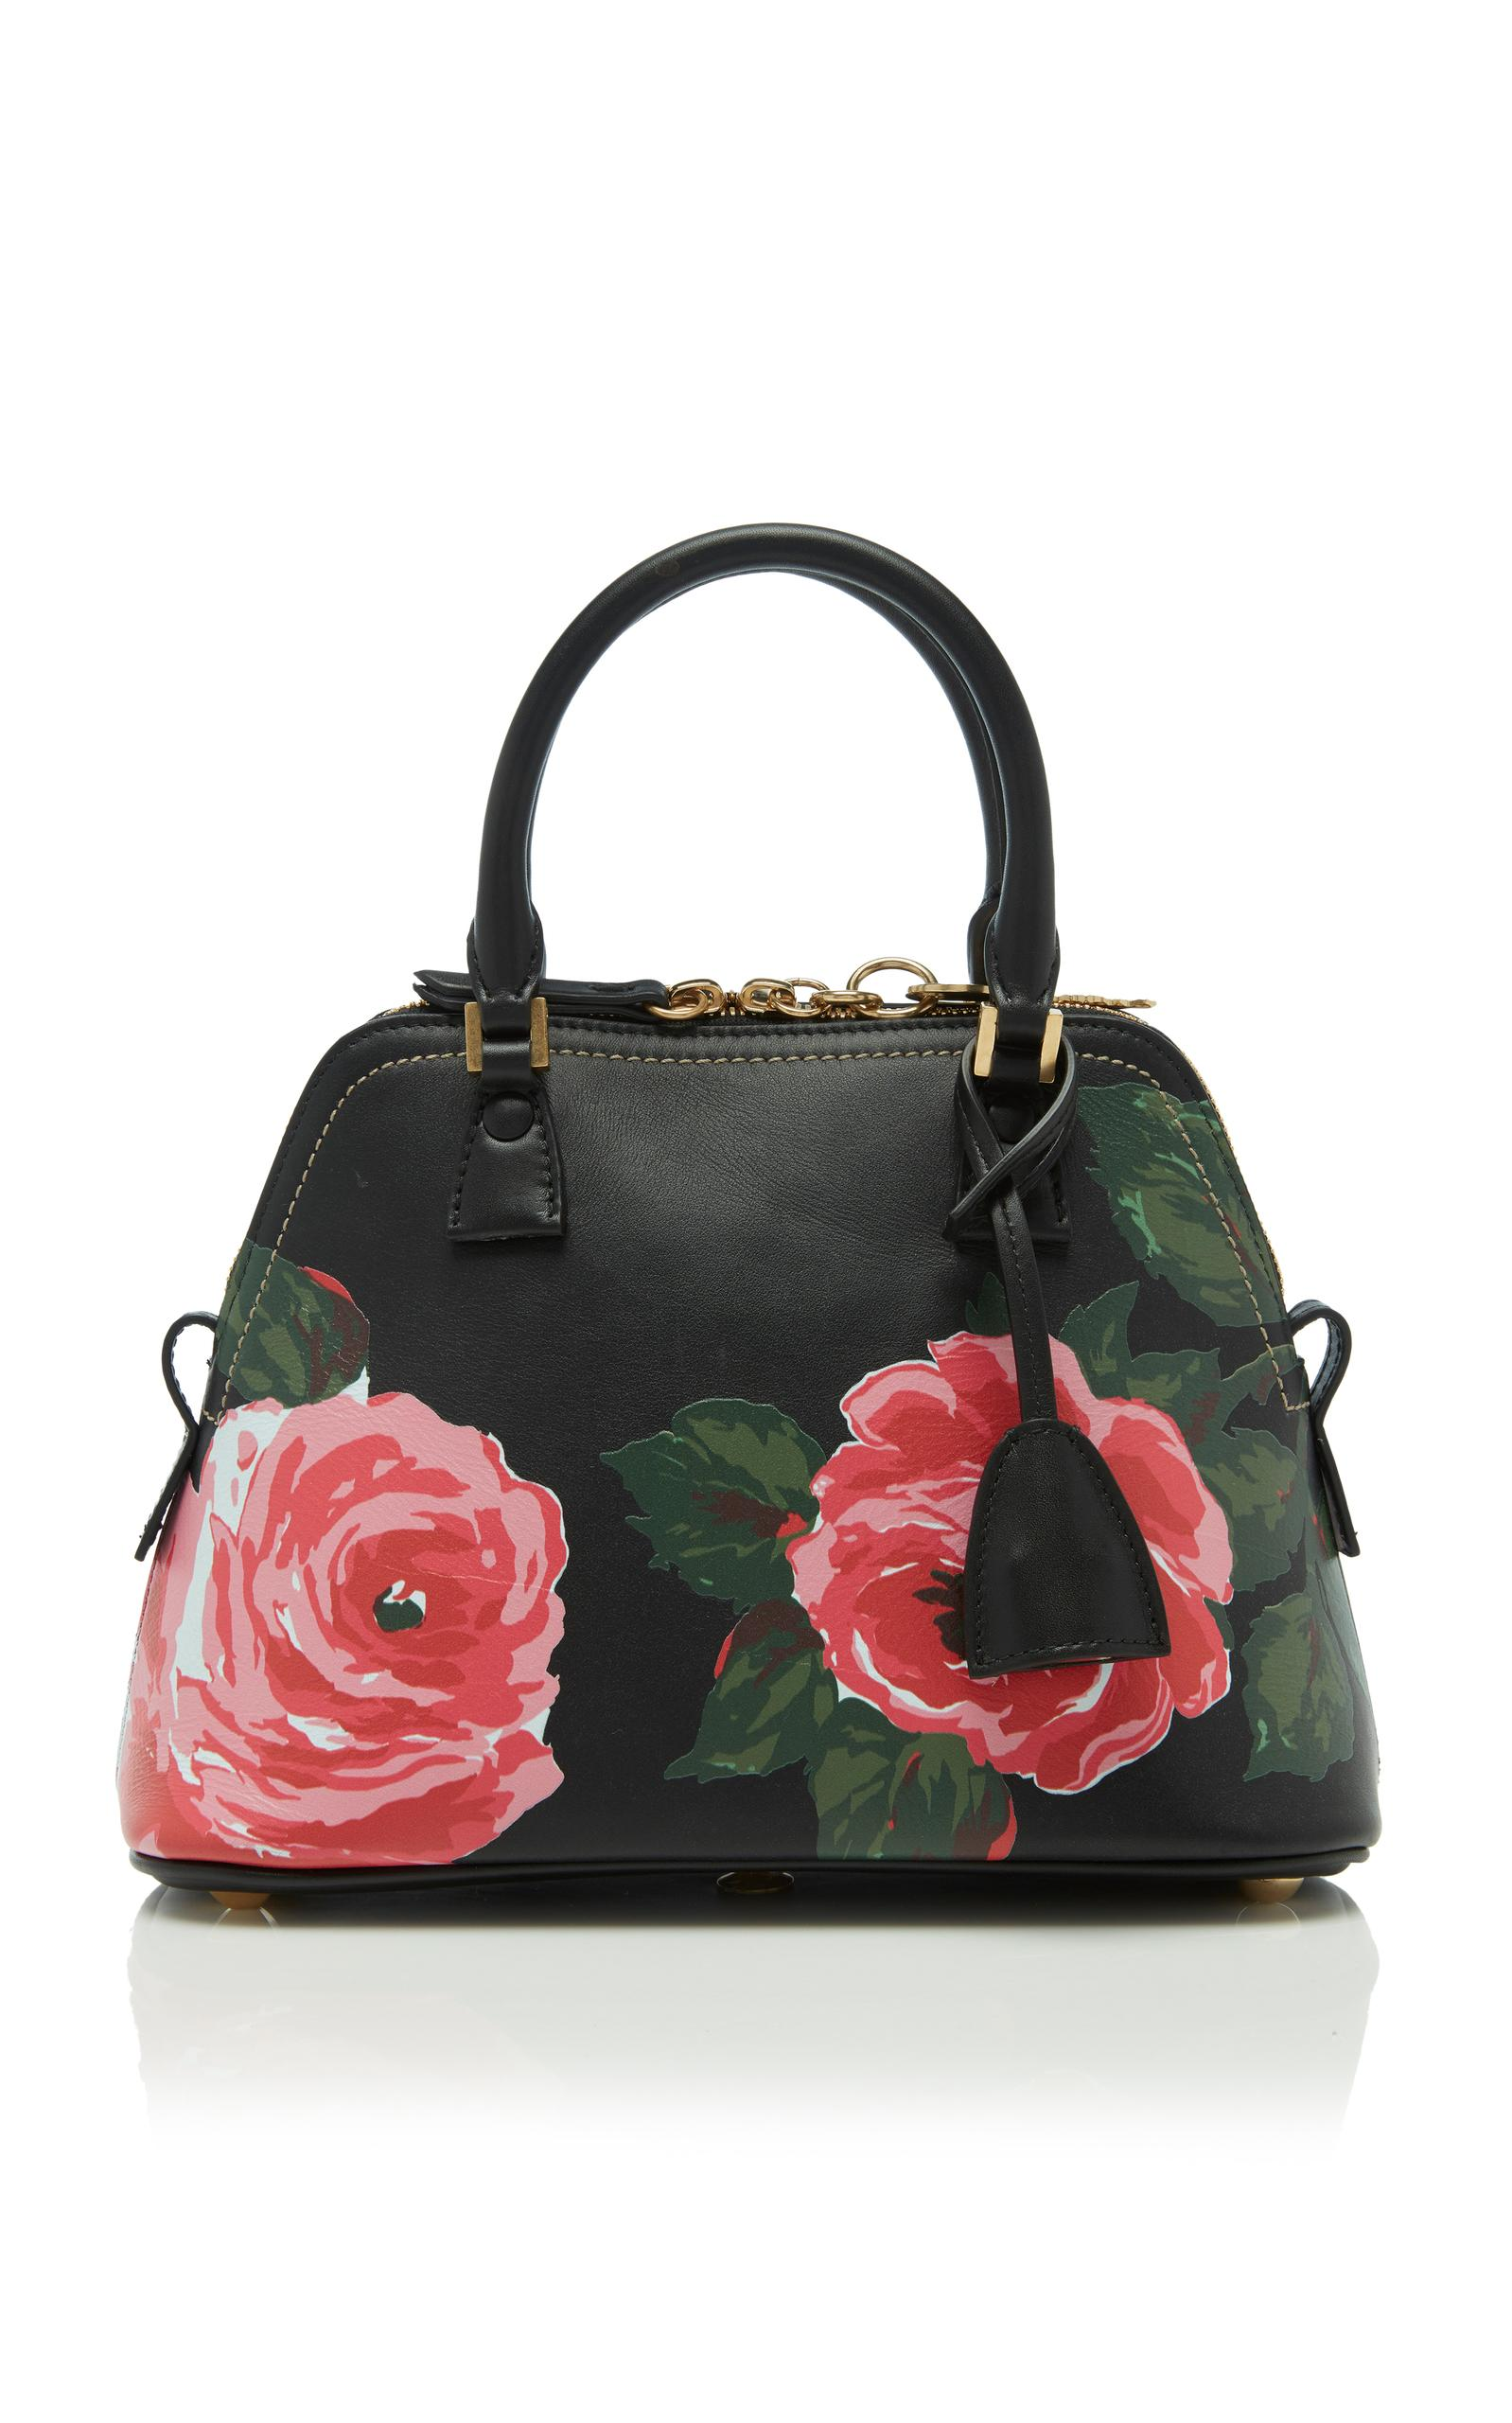 Maison Margiela 5Ac Mini Tote Bag In Floral